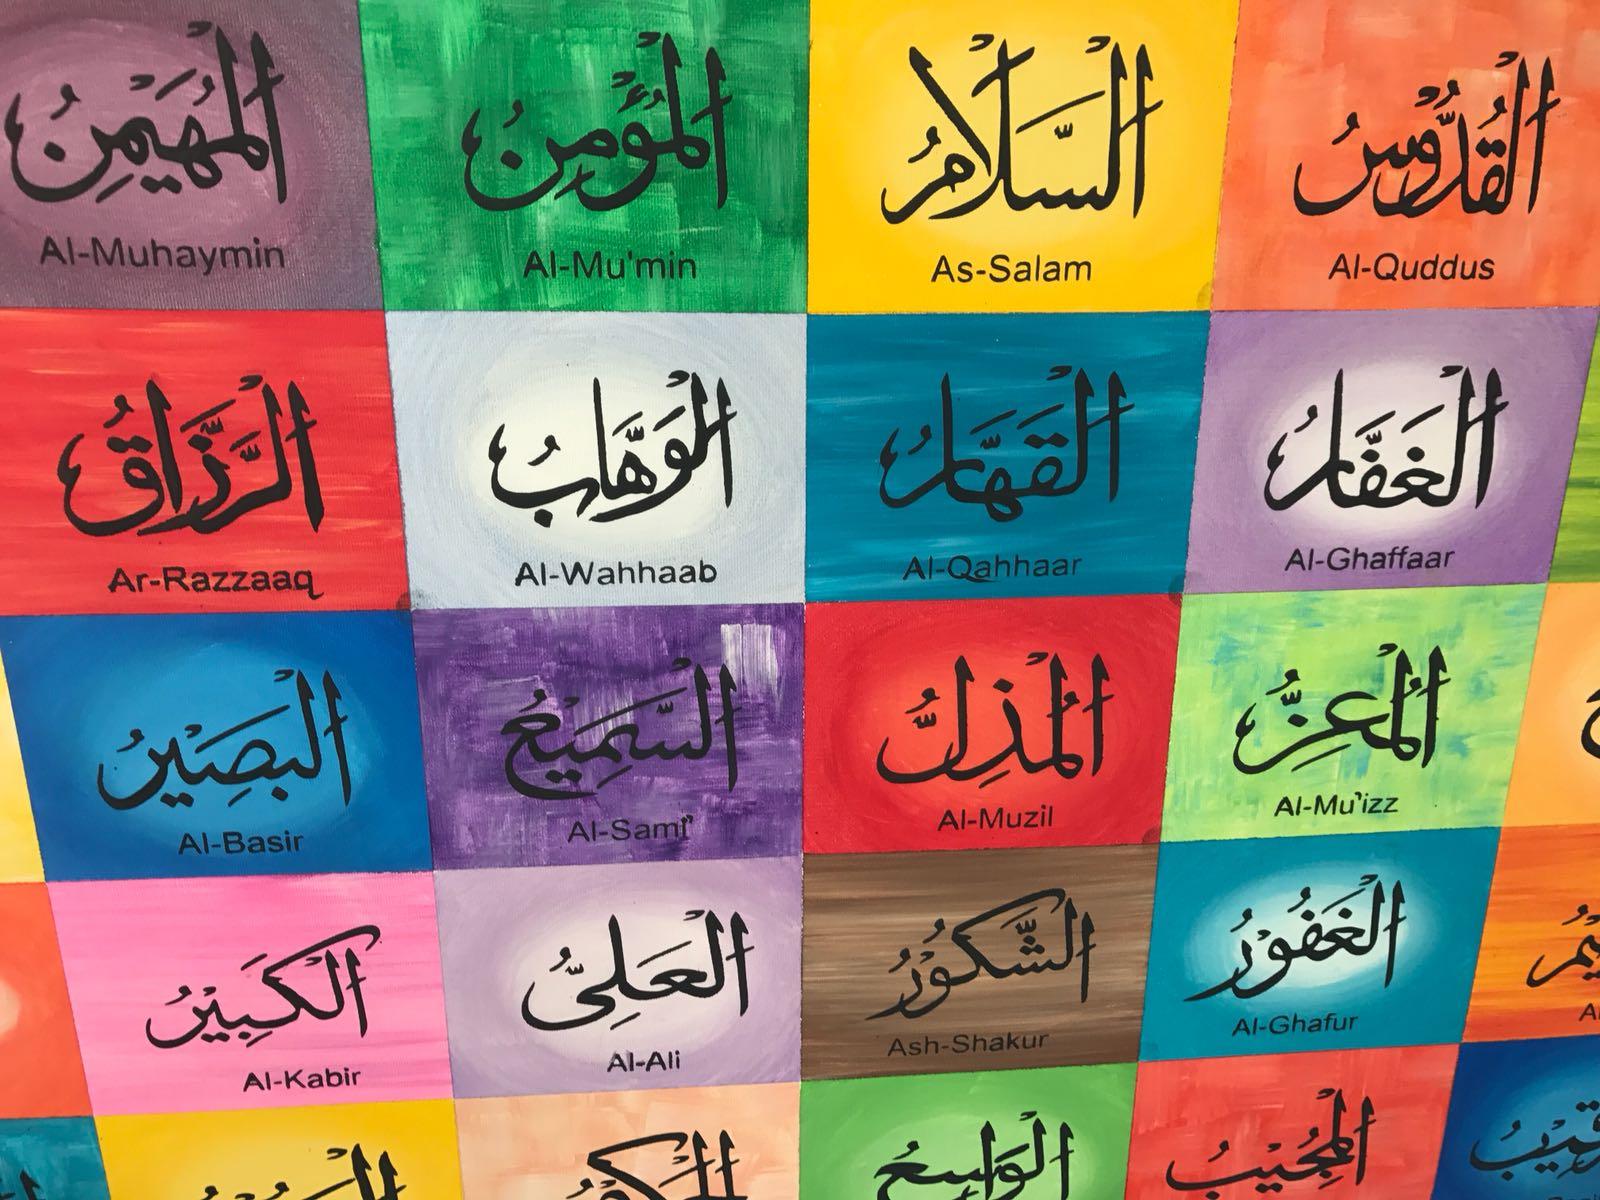 25 Prophet Names In Arabic 1600x1200 Wallpaper Teahub Io